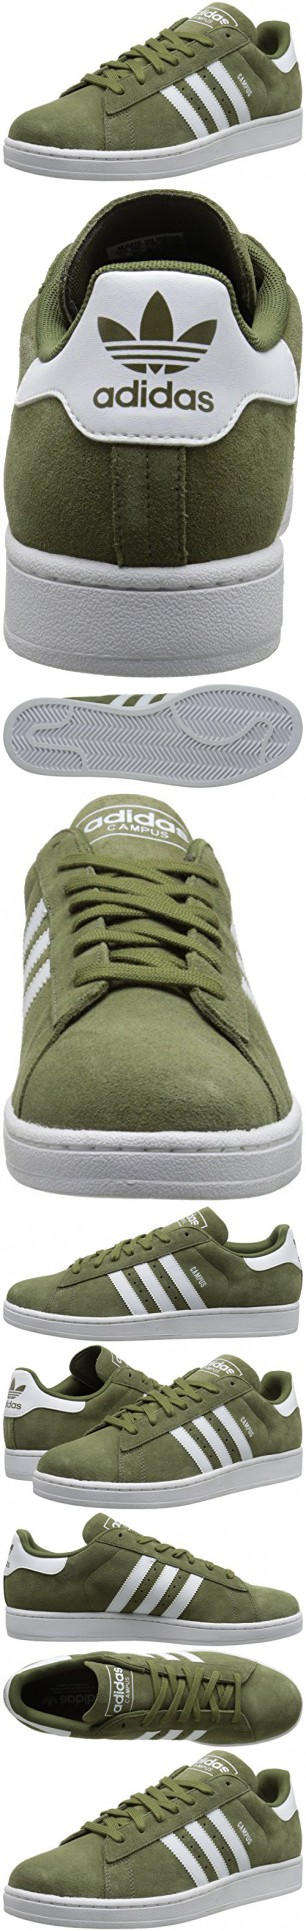 Adidas Originali Degli Uomini Di Campus 2 Basket Scarpa, Olio D'oliva